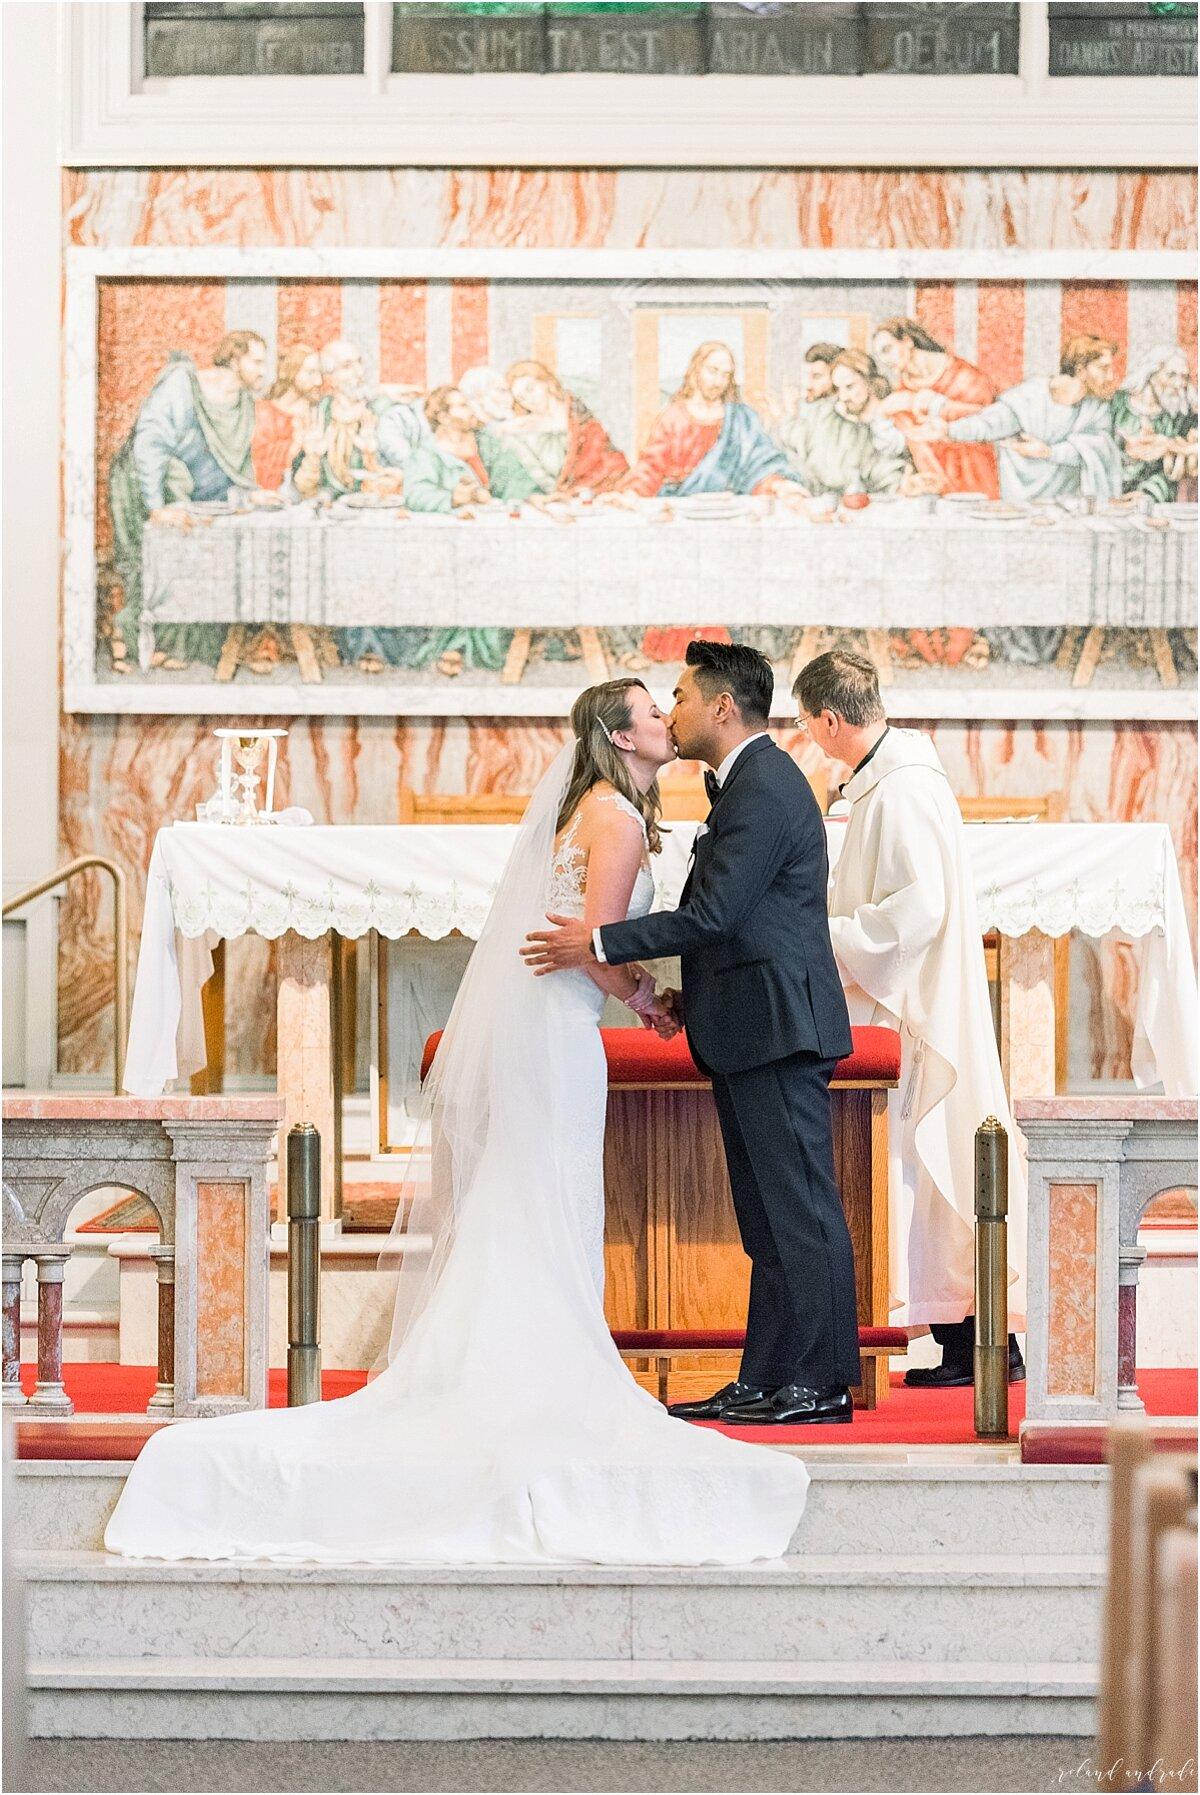 River Roast Wedding + Light and Airy Wedding Photographer Chicago + renaissance Hotel Wedding Photographer + Chicago Photography + Naperville Wedding Photographer + Chicago Engagement Photographer + Best Photographer In Chicago_0036.jpg